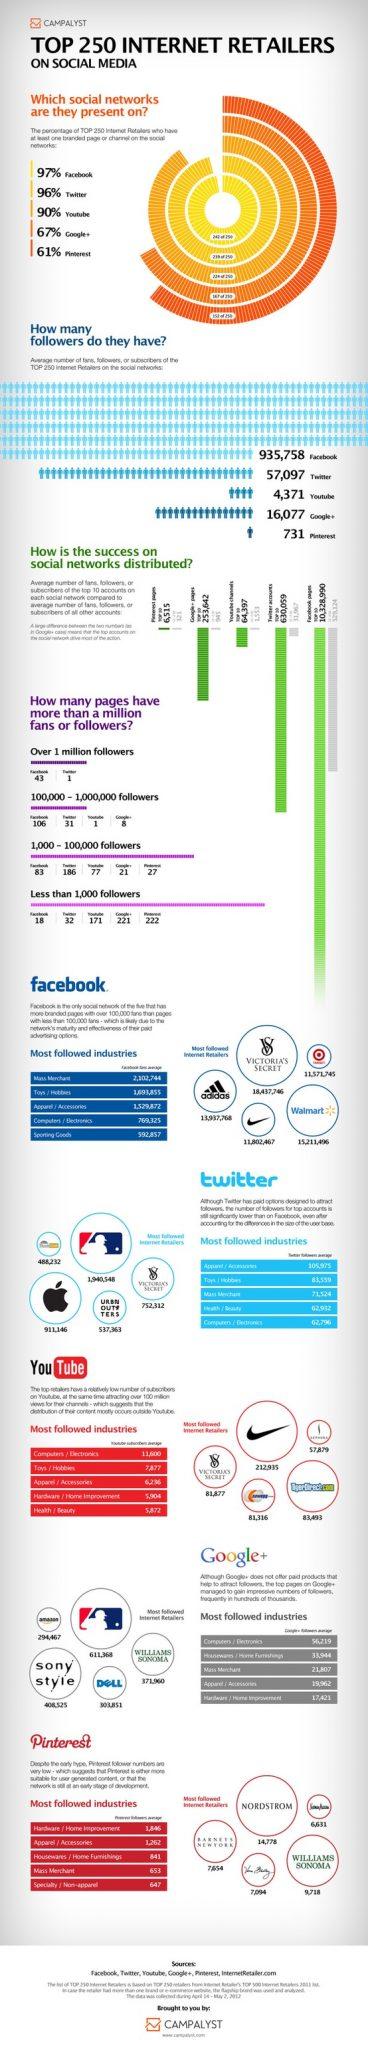 Social Media Retail Infographic